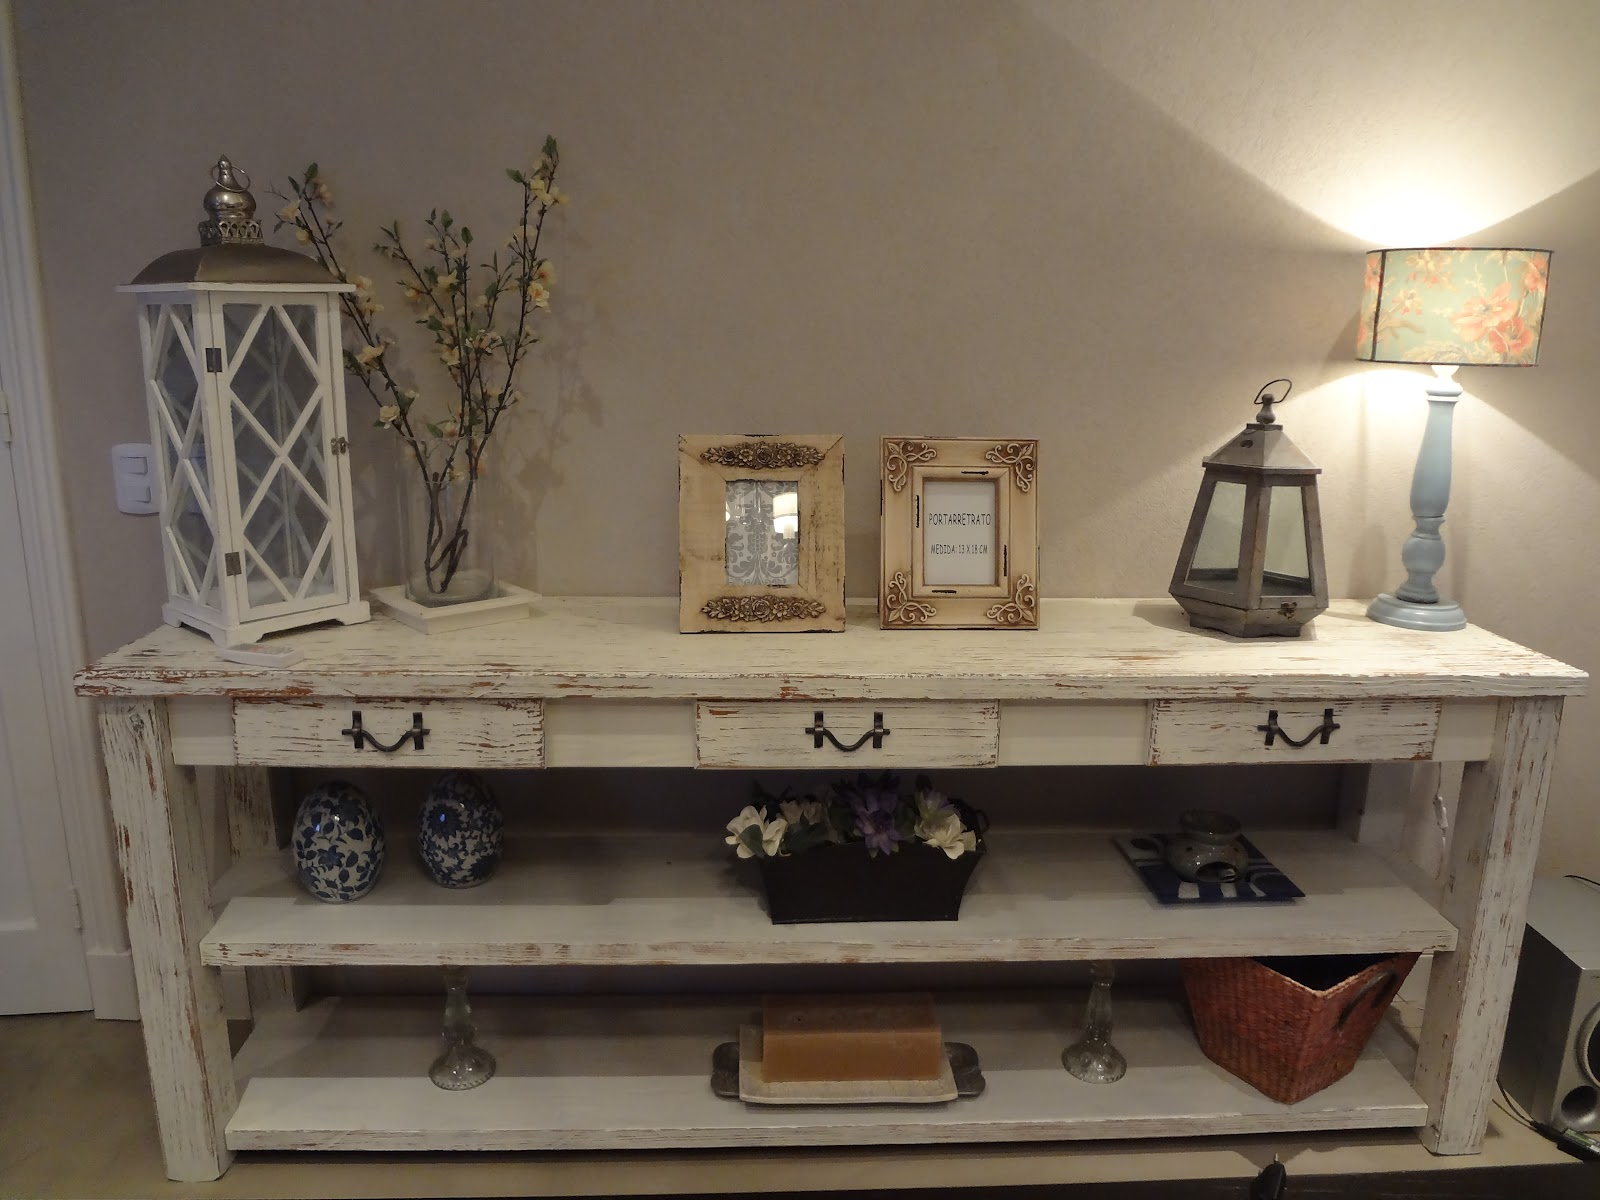 Shabby moderno mesa de arrime blanca con madera natural for Mesa blanca y madera